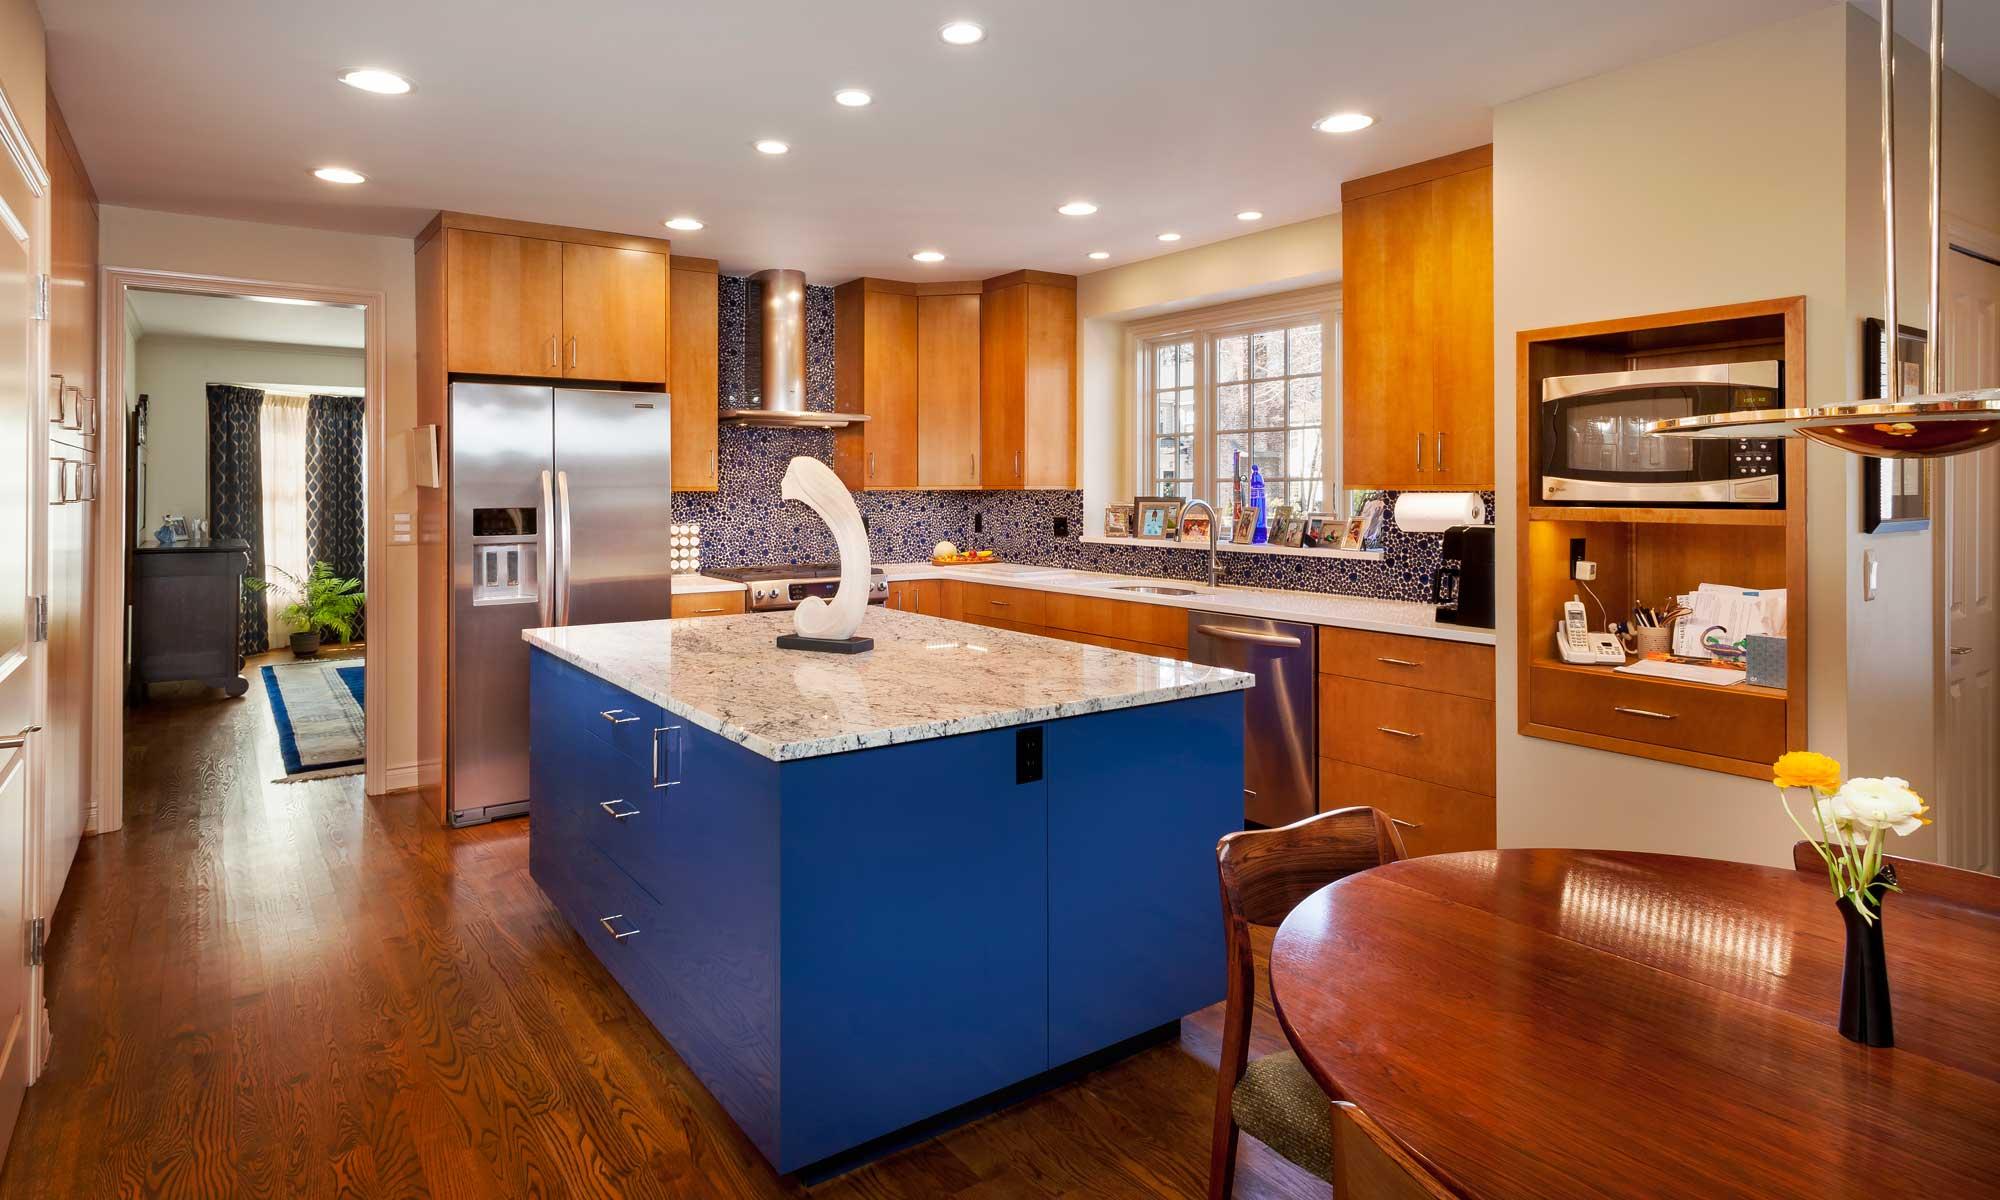 modern kitchen with blue cabinet